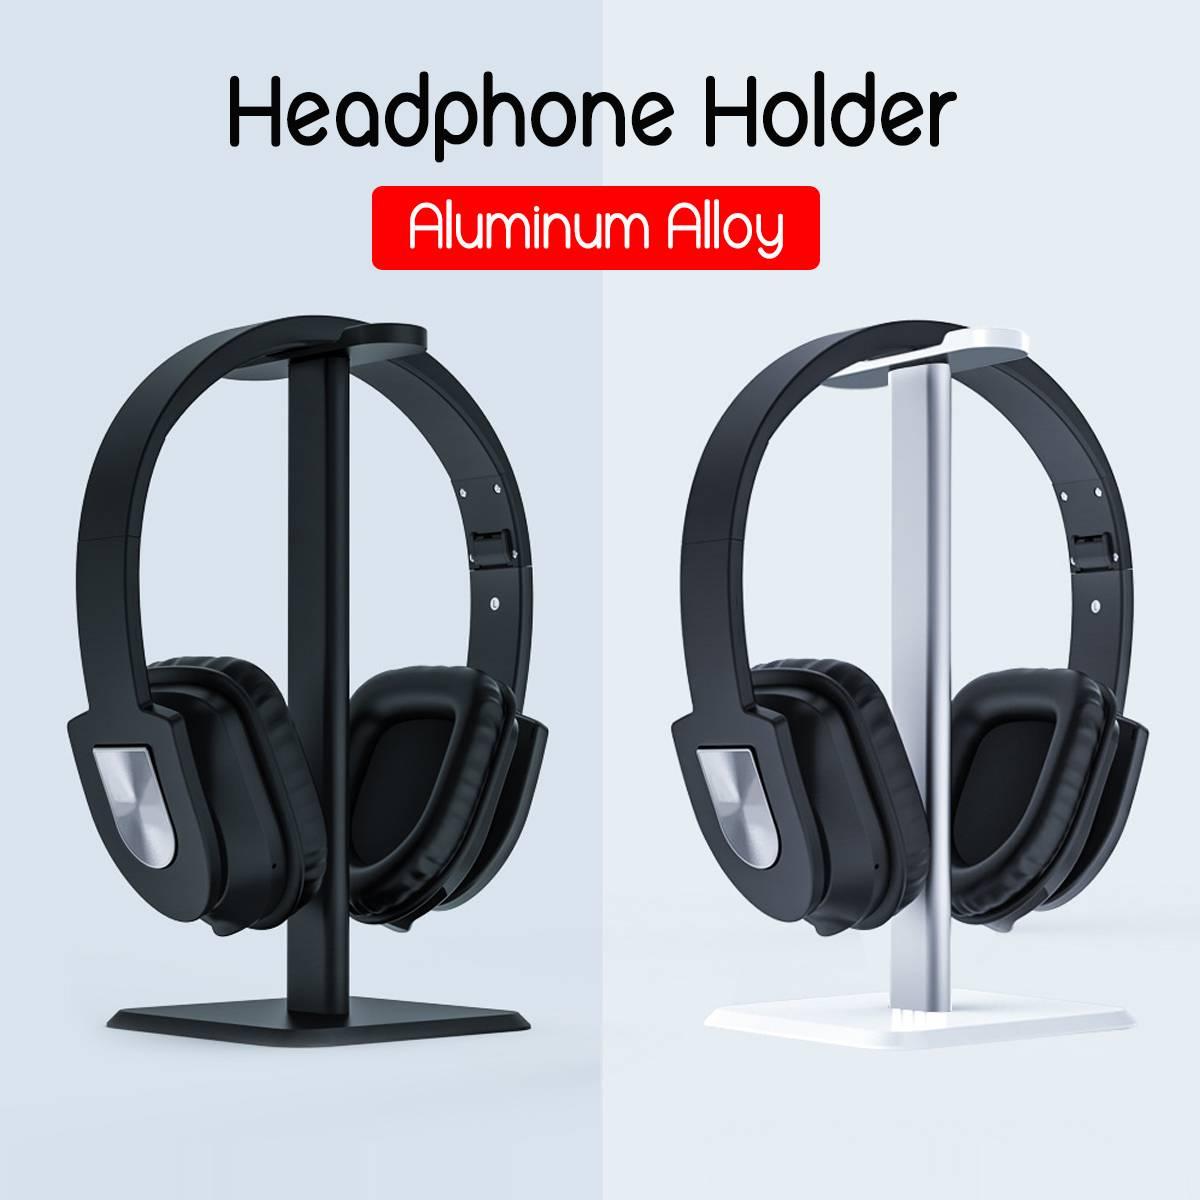 Soporte Universal de aluminio para auriculares, soporte para auriculares, colgador para auriculares, soporte de escritorio, soporte para estante, soporte para colgar